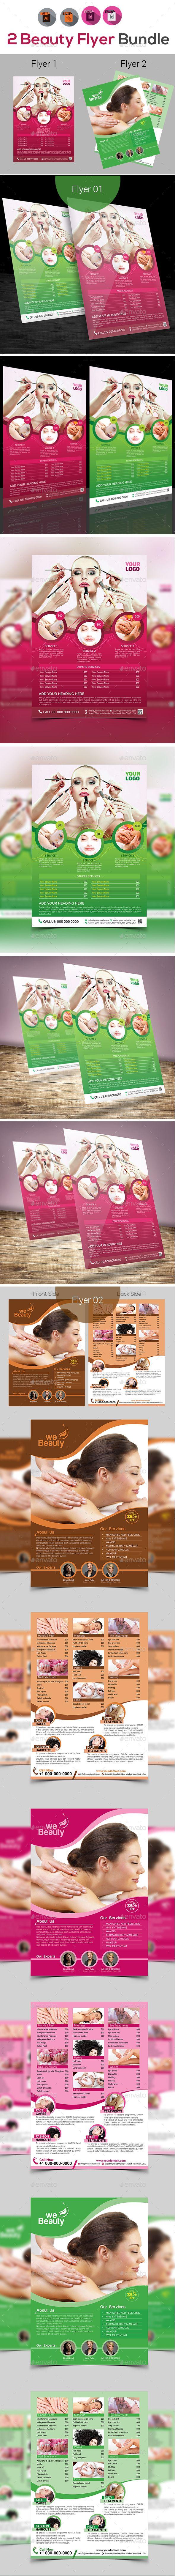 Spa | Beauty | Salon Flyer Template Bundle - Vector EPS, InDesign INDD, AI Illustrator